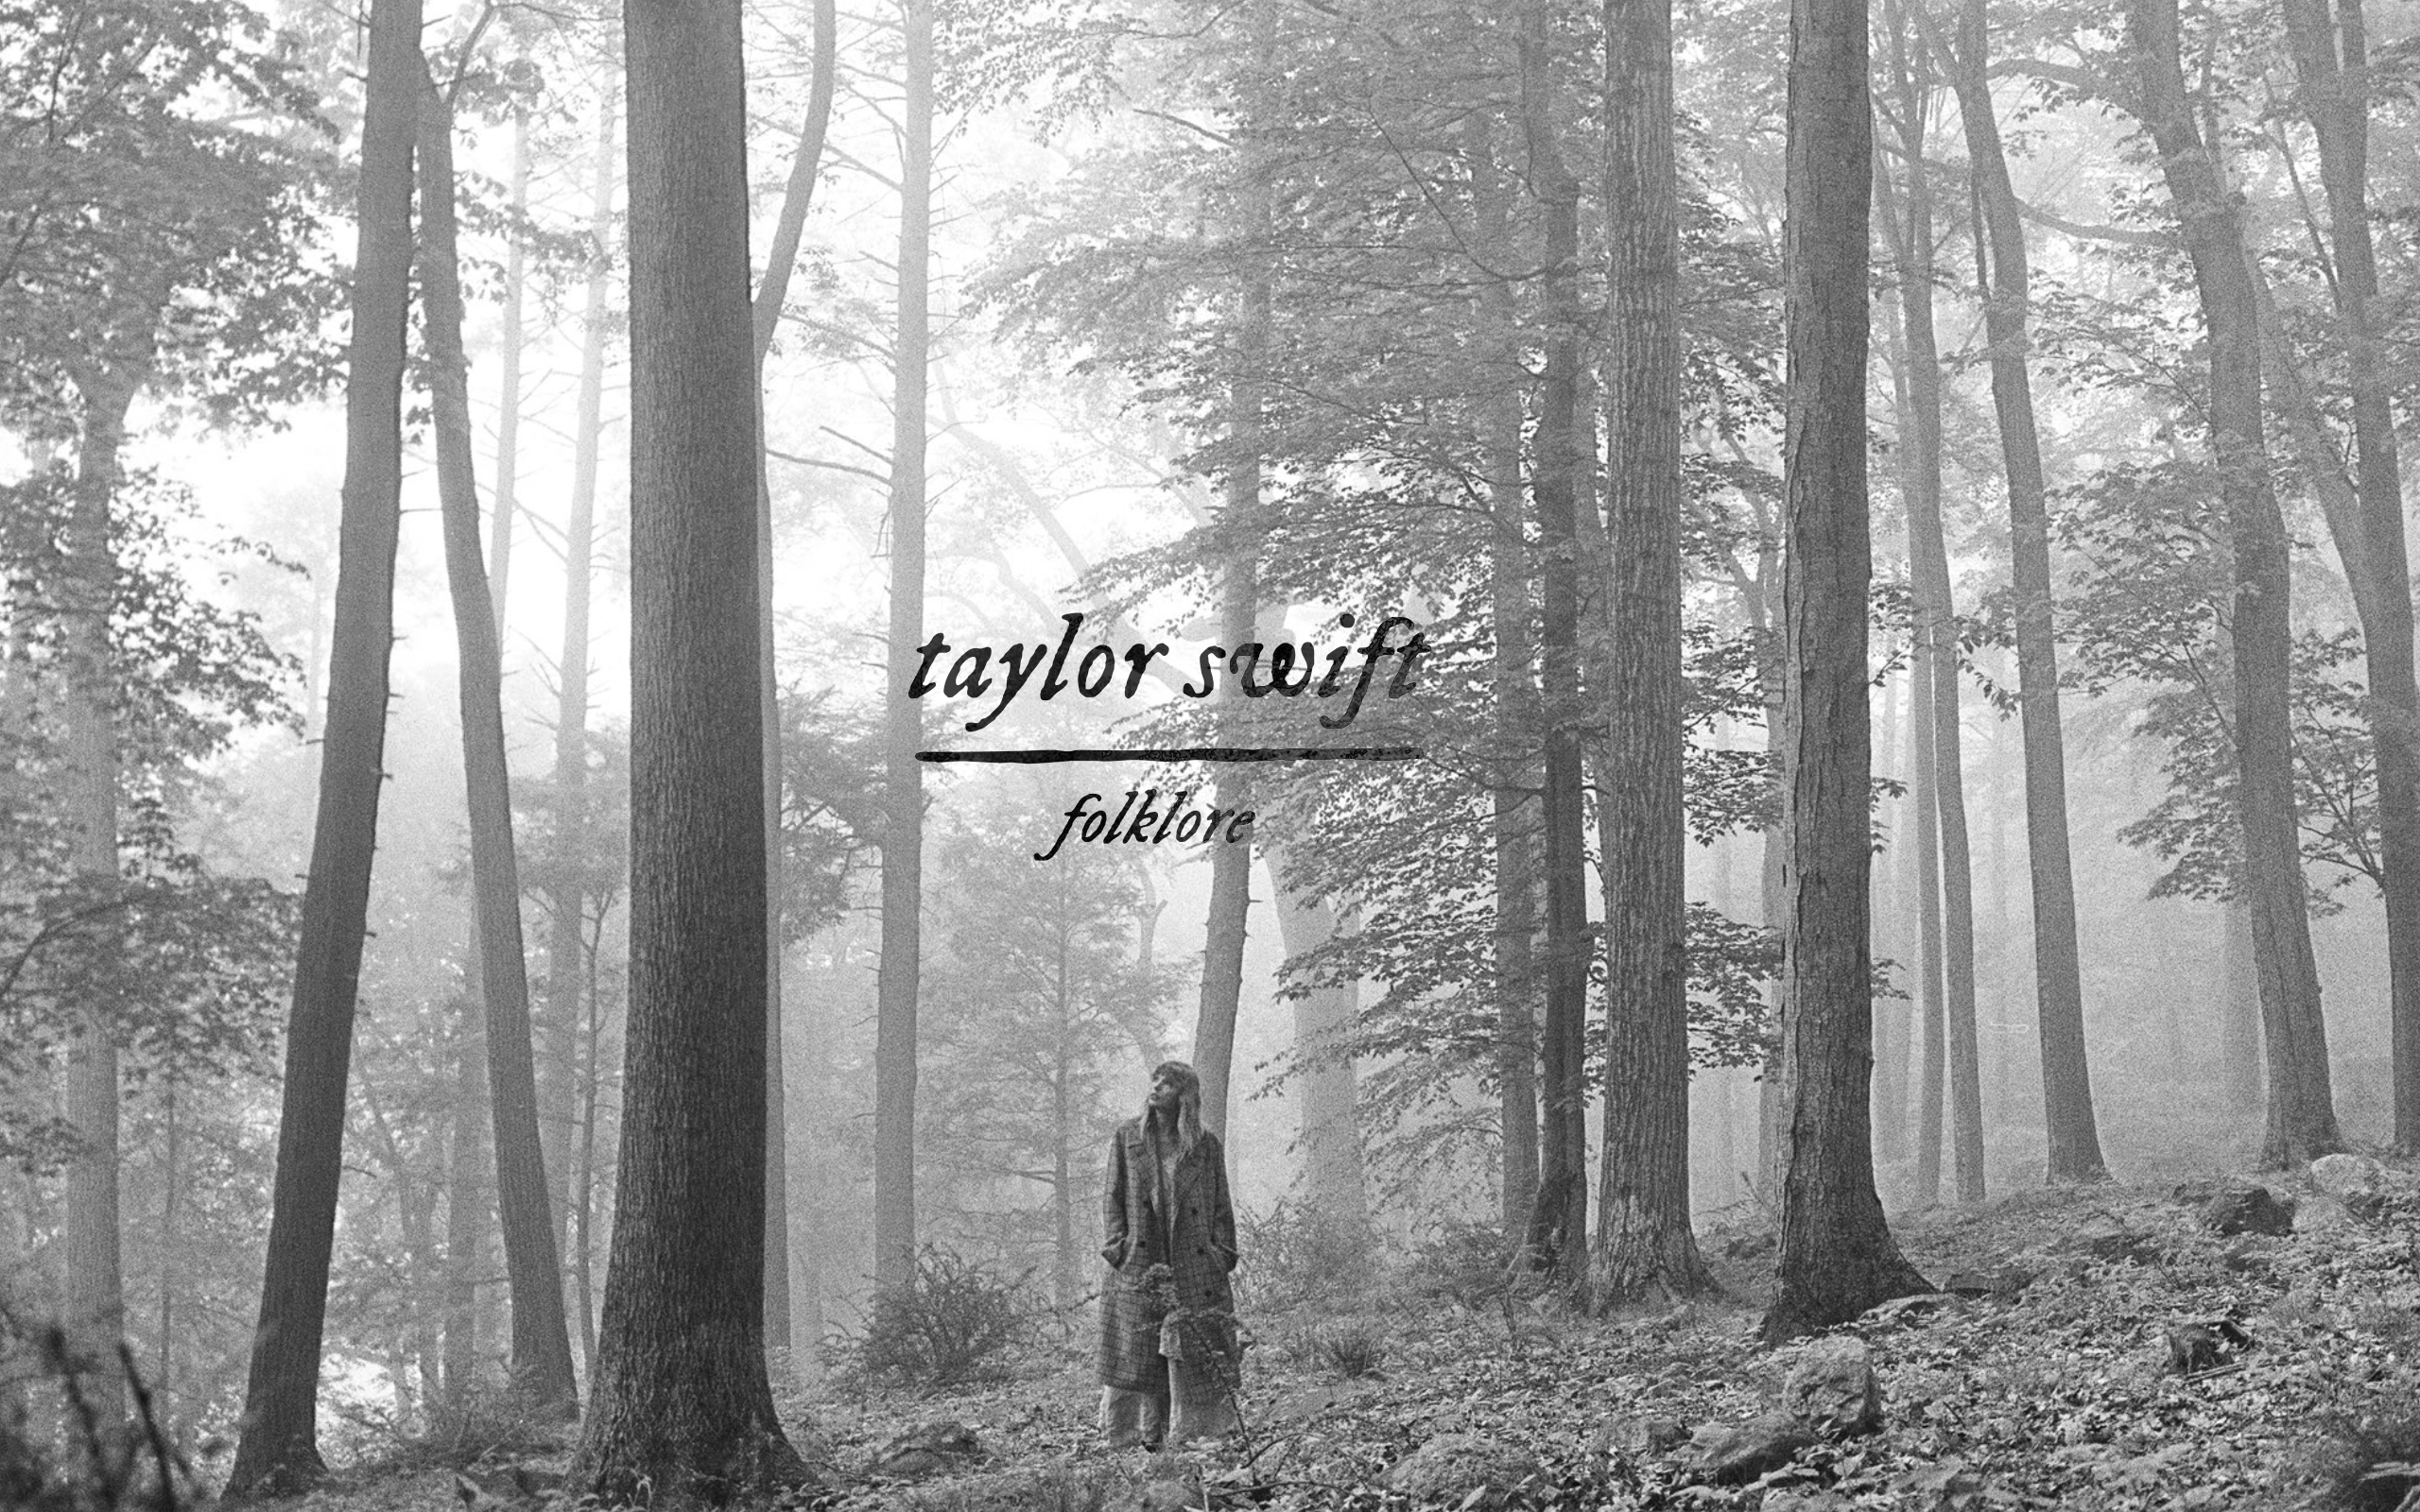 Fondos de pantalla Folklore de Taylor Swift